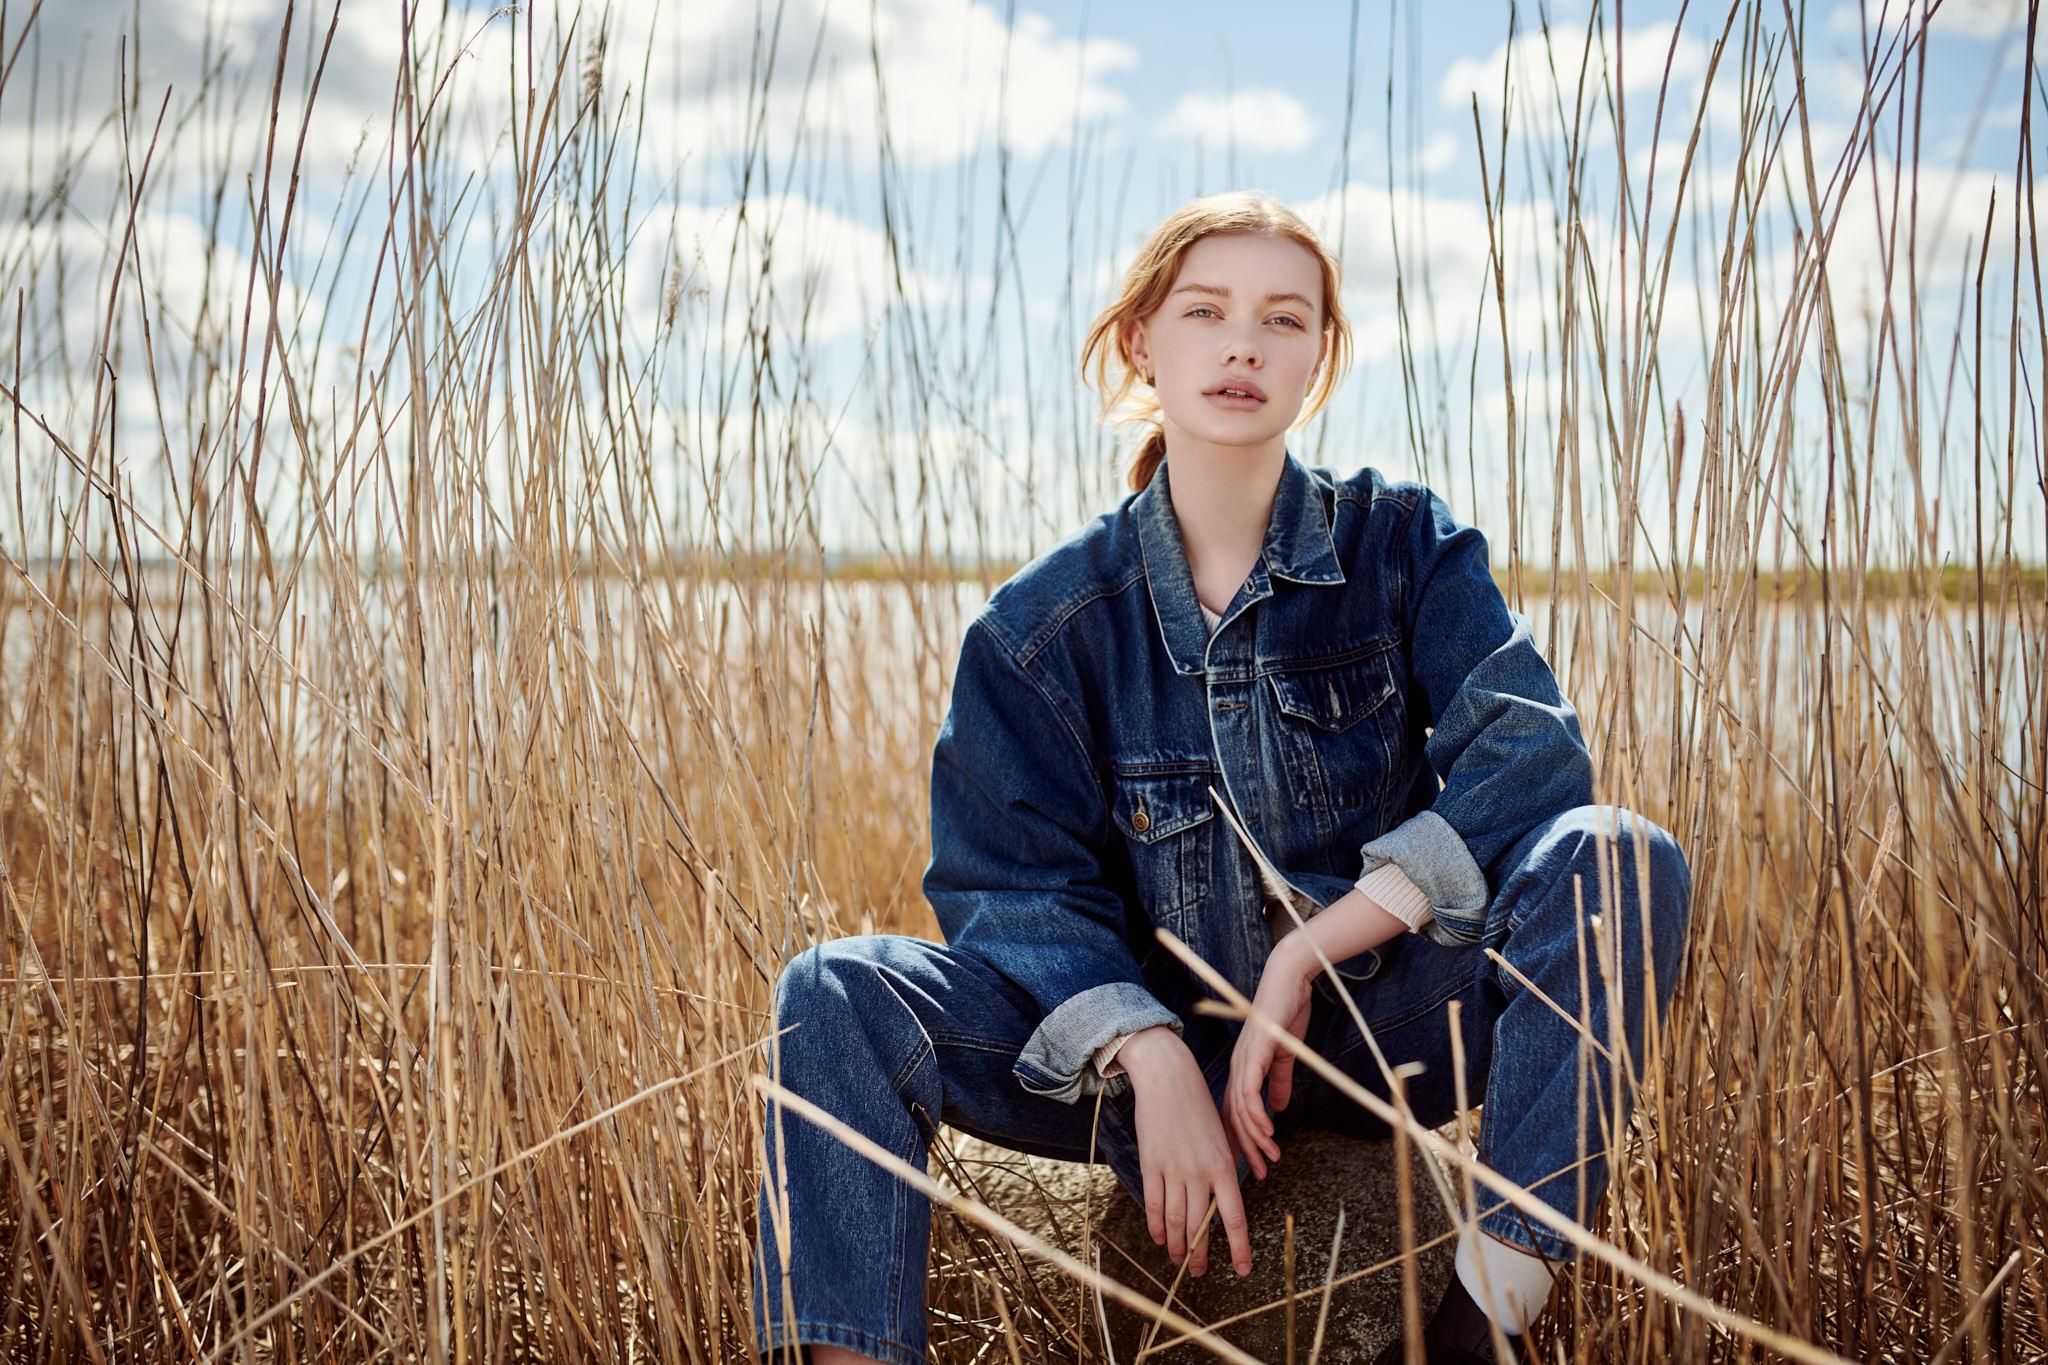 Aarhus - Fashion in nature